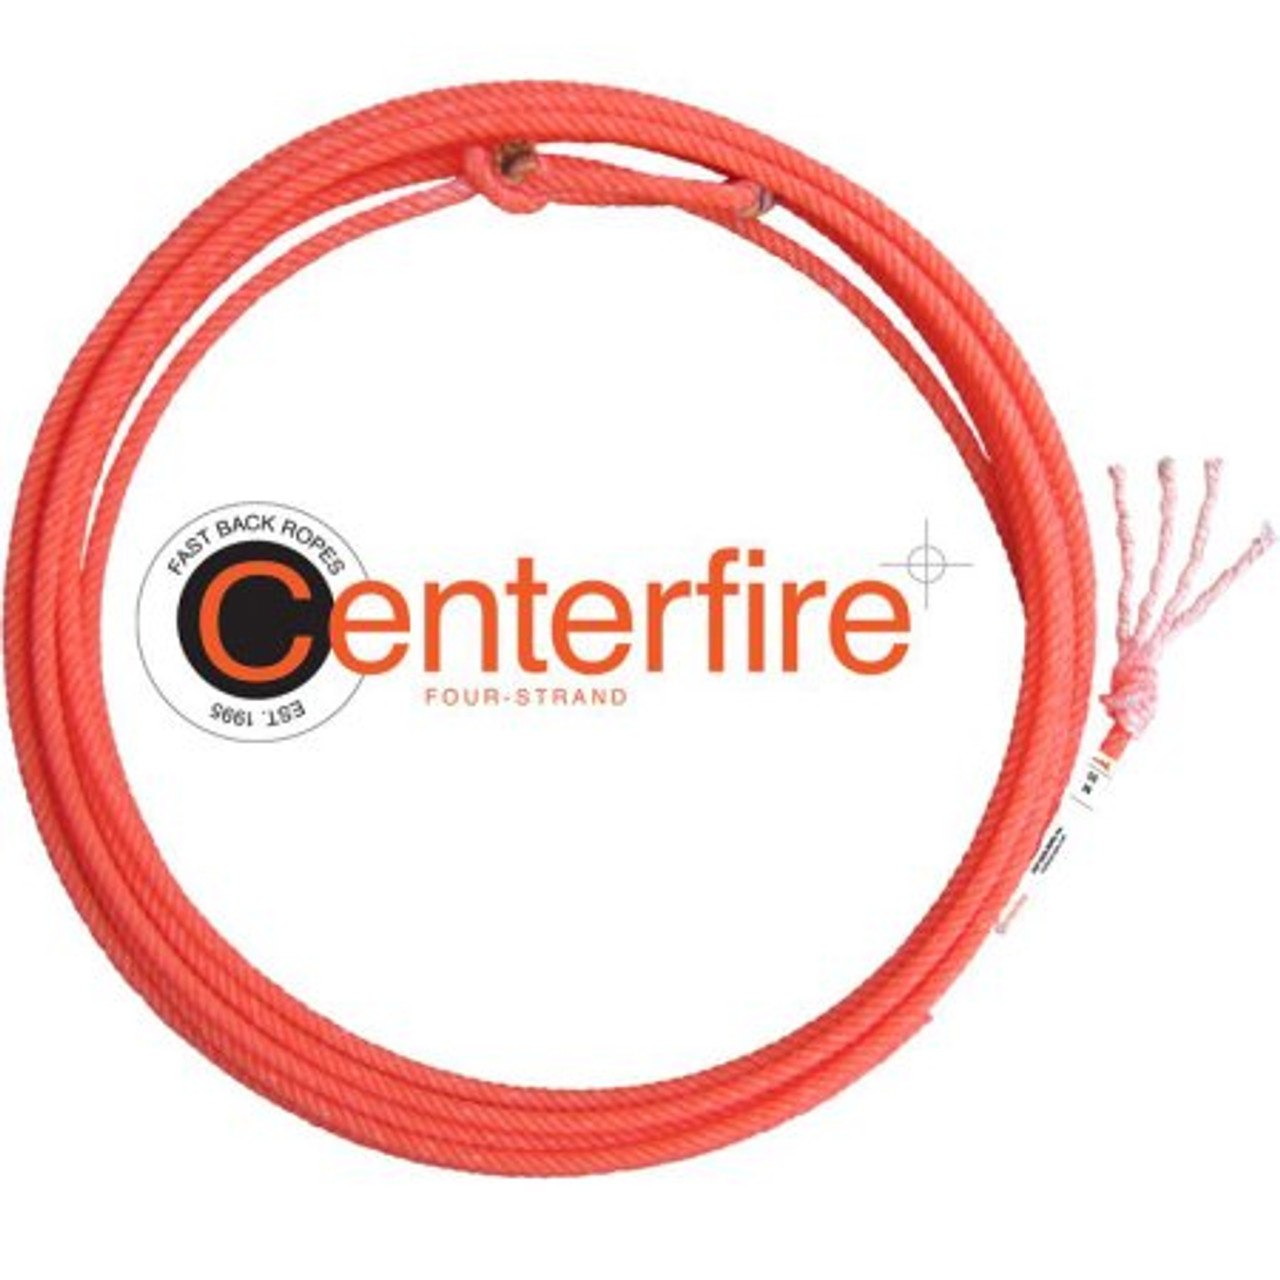 Fast Back Centerfire - Heel Rope 35'